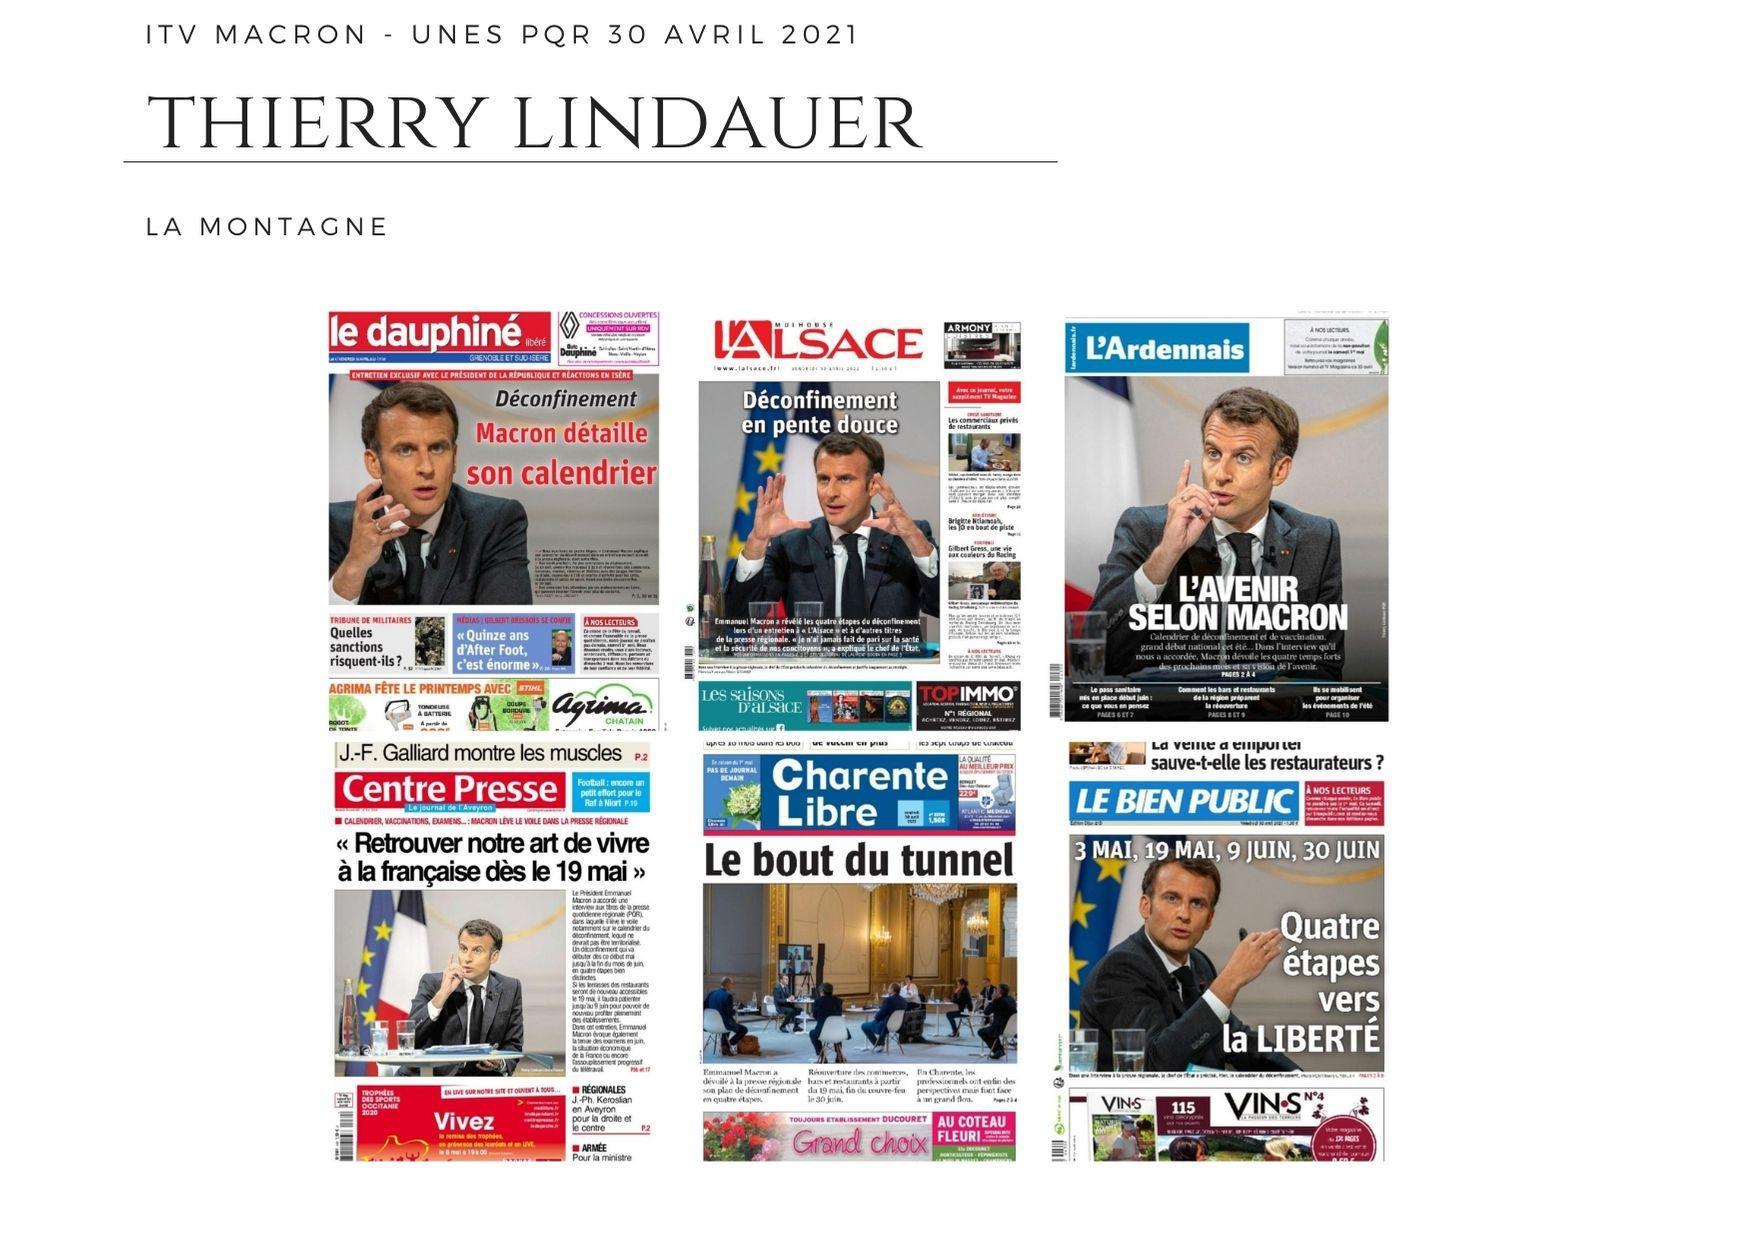 ITV Macron - Unes PQR  30 avril 2021